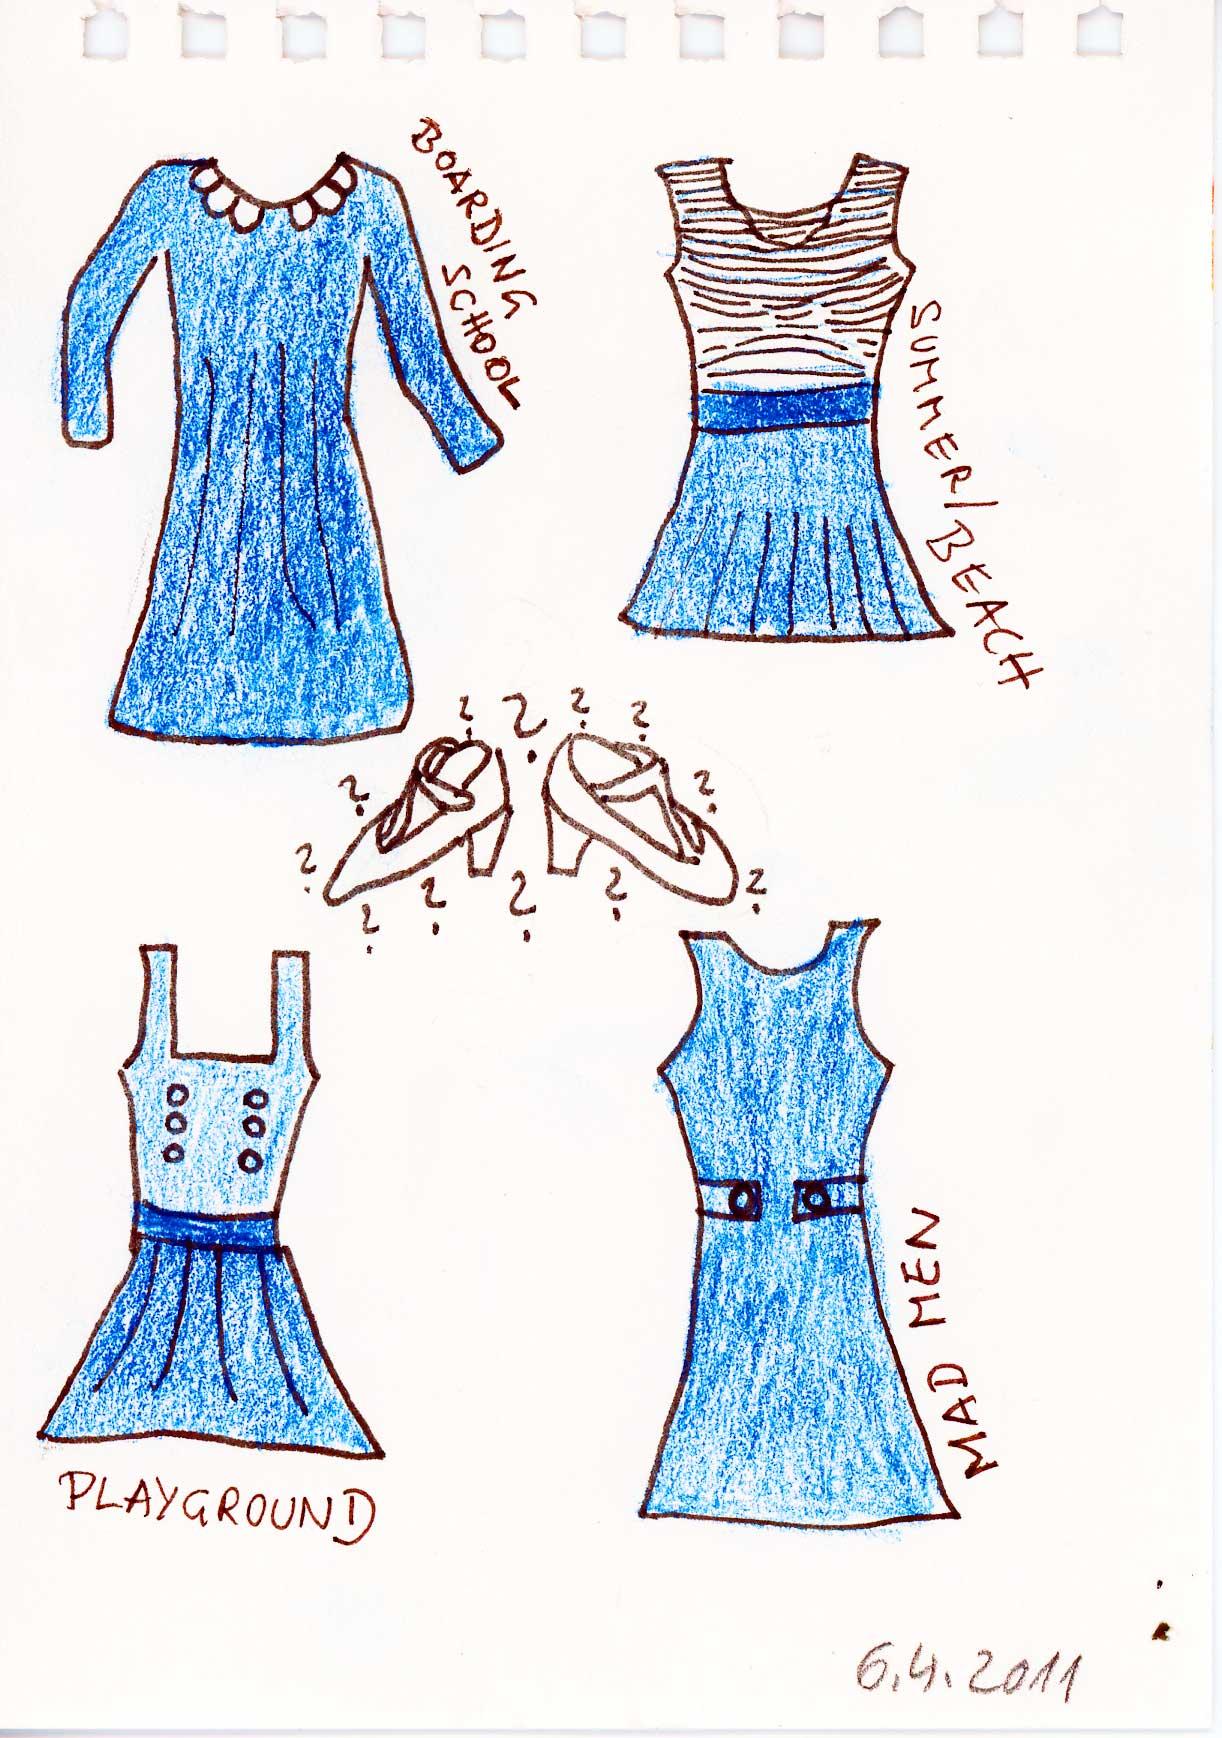 Be Creative #96 - Blue dresses, © Ines Häufler, 2011